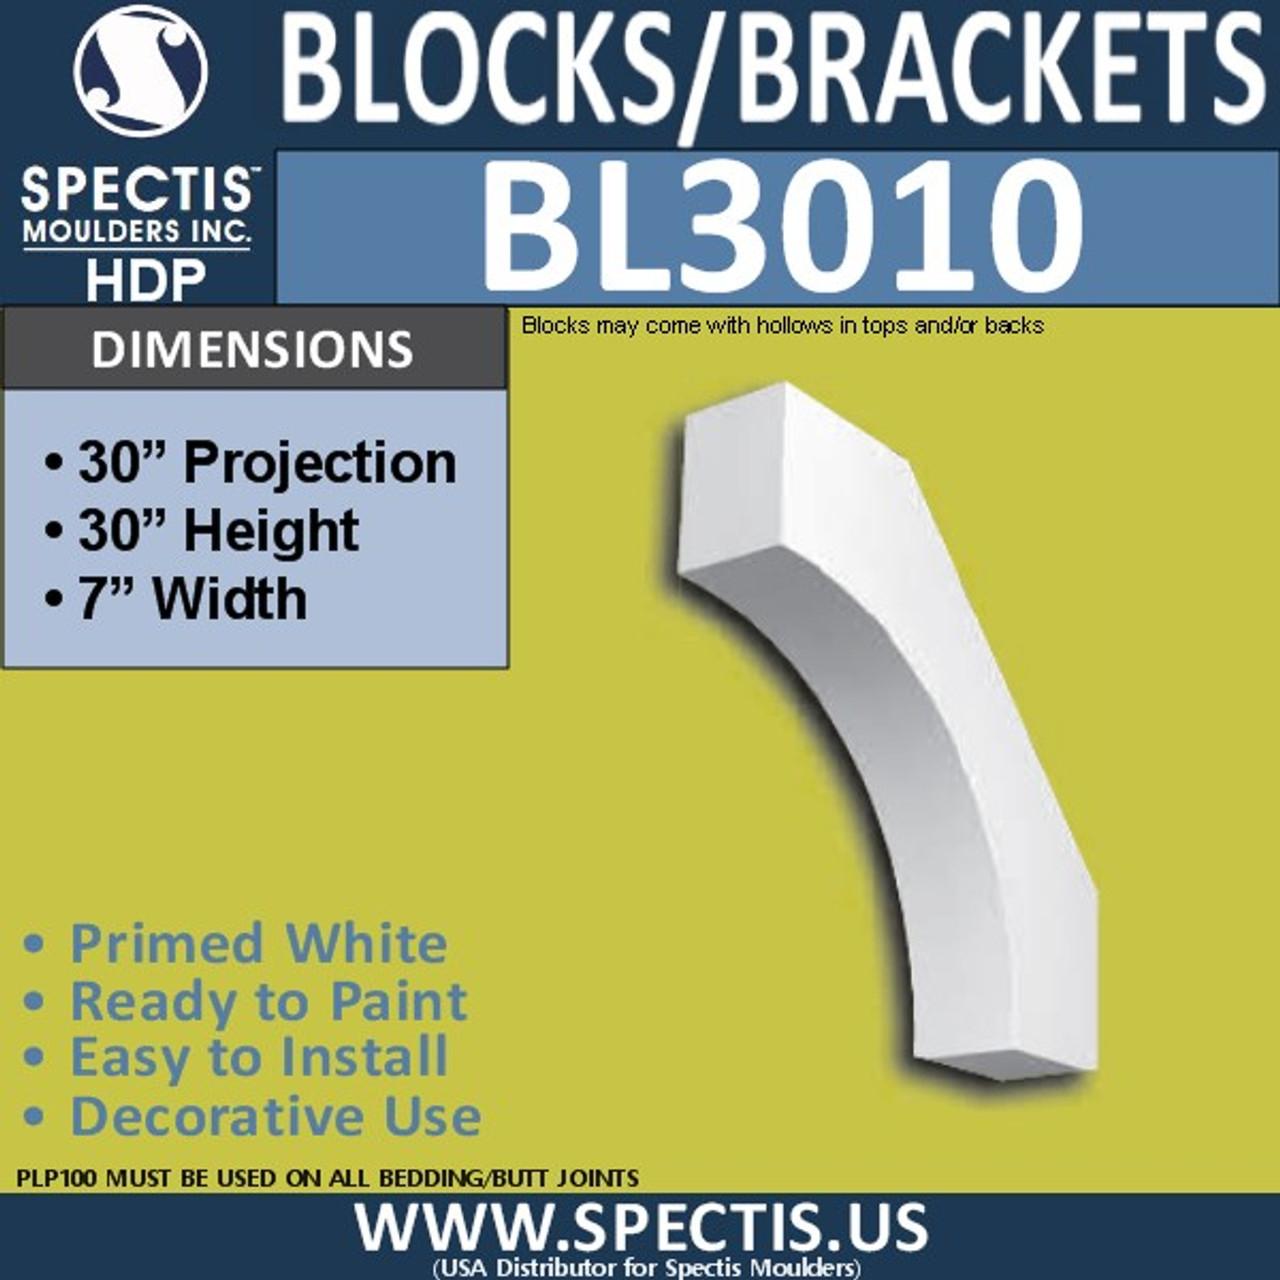 "BL3010 Eave Block or Bracket 7""W x 30""H x 30"" P"